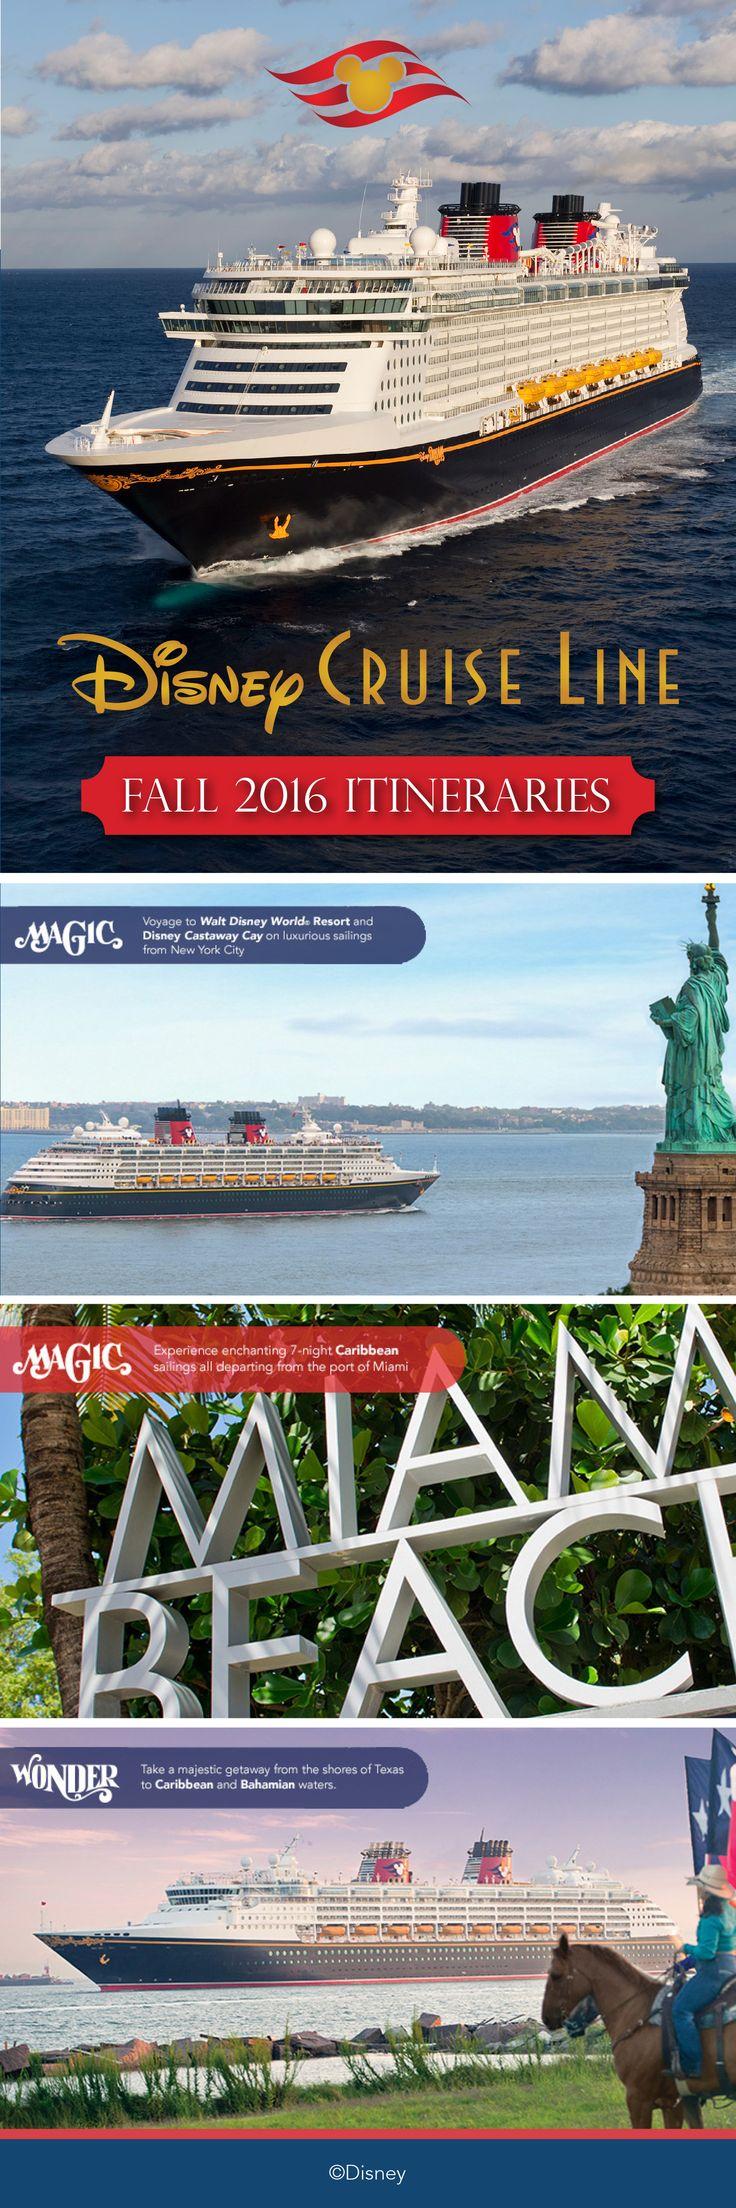 17 Best Images About Disney Cruise Line Destinations On Pinterest  Disney T